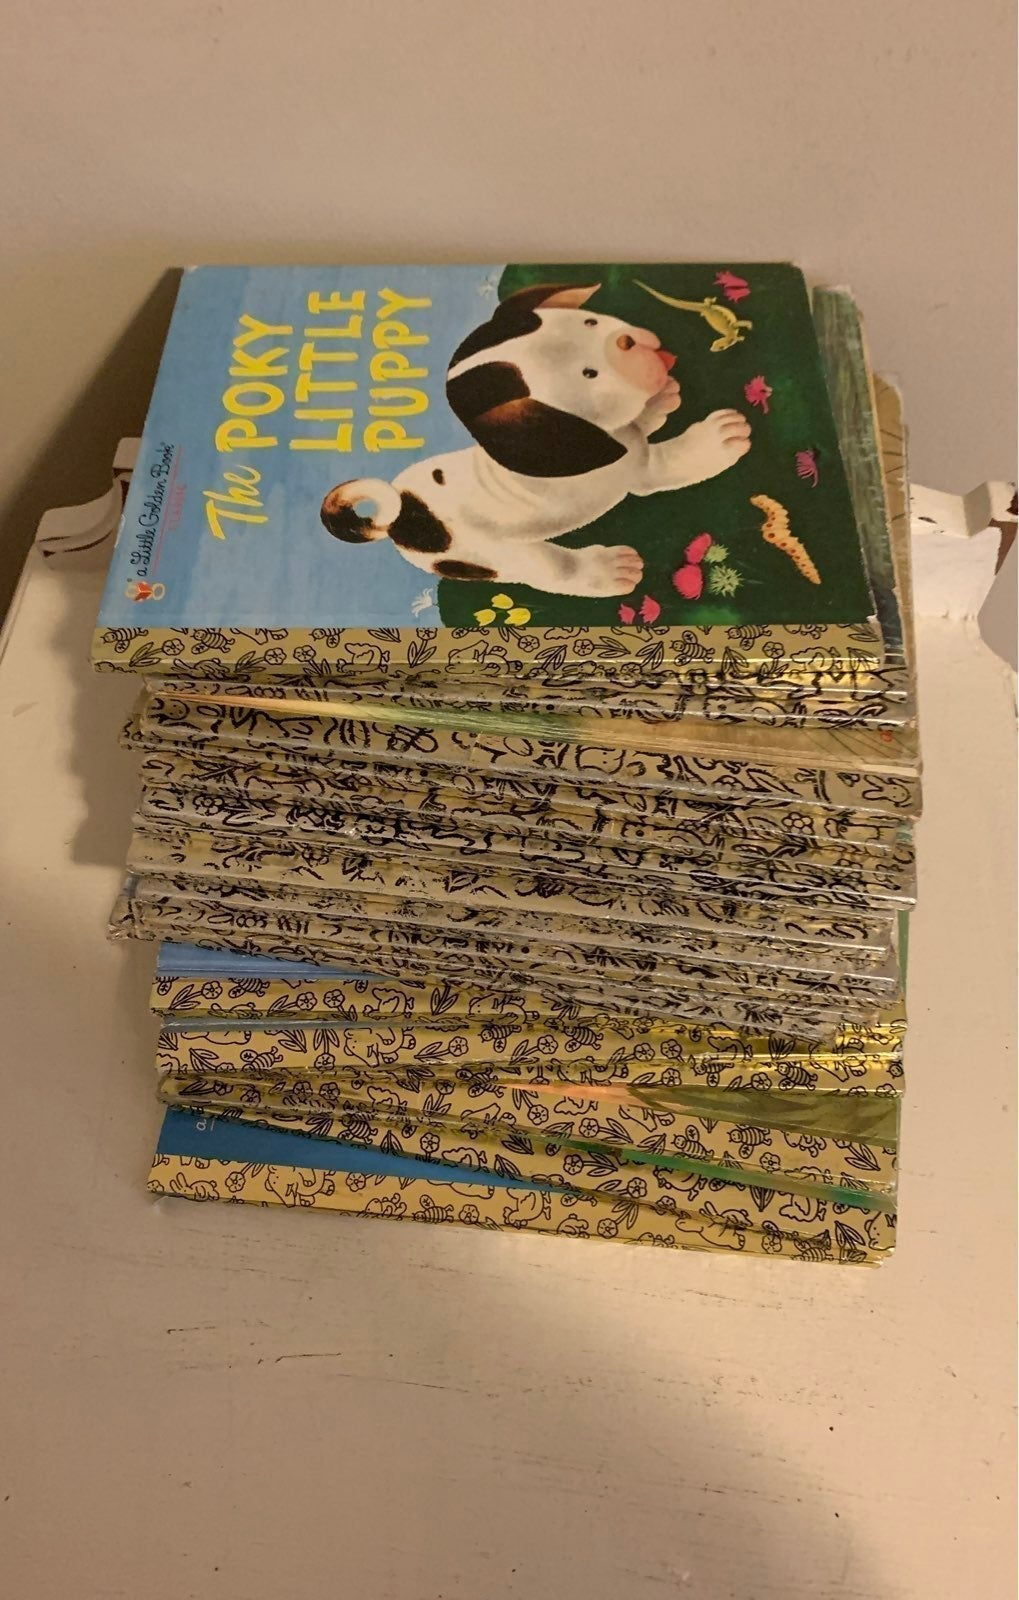 Lot of Vintage Golden Books: 20 included